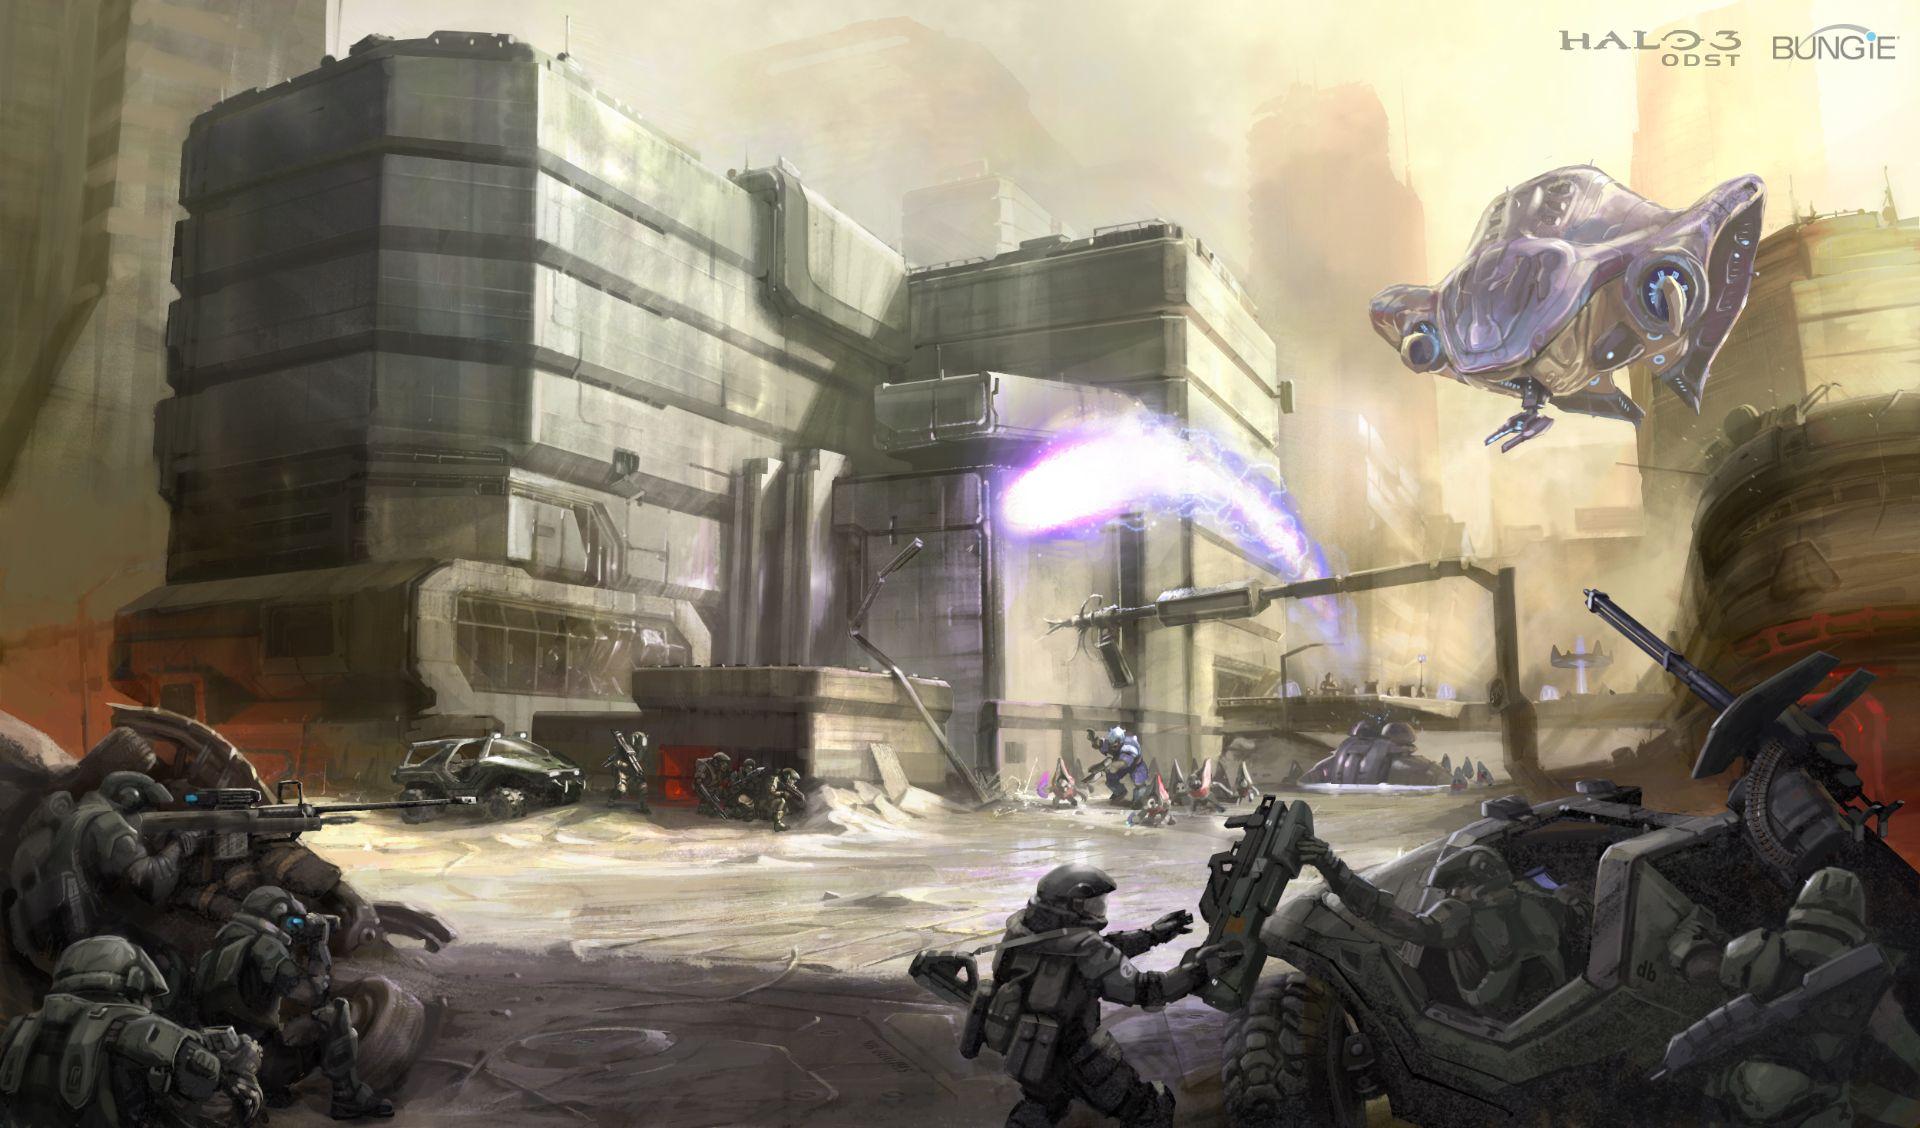 Halo 3 Odst Concept Art City Fight Jpg 1920 1128 Halo 3 Odst Concept Art Halo Series